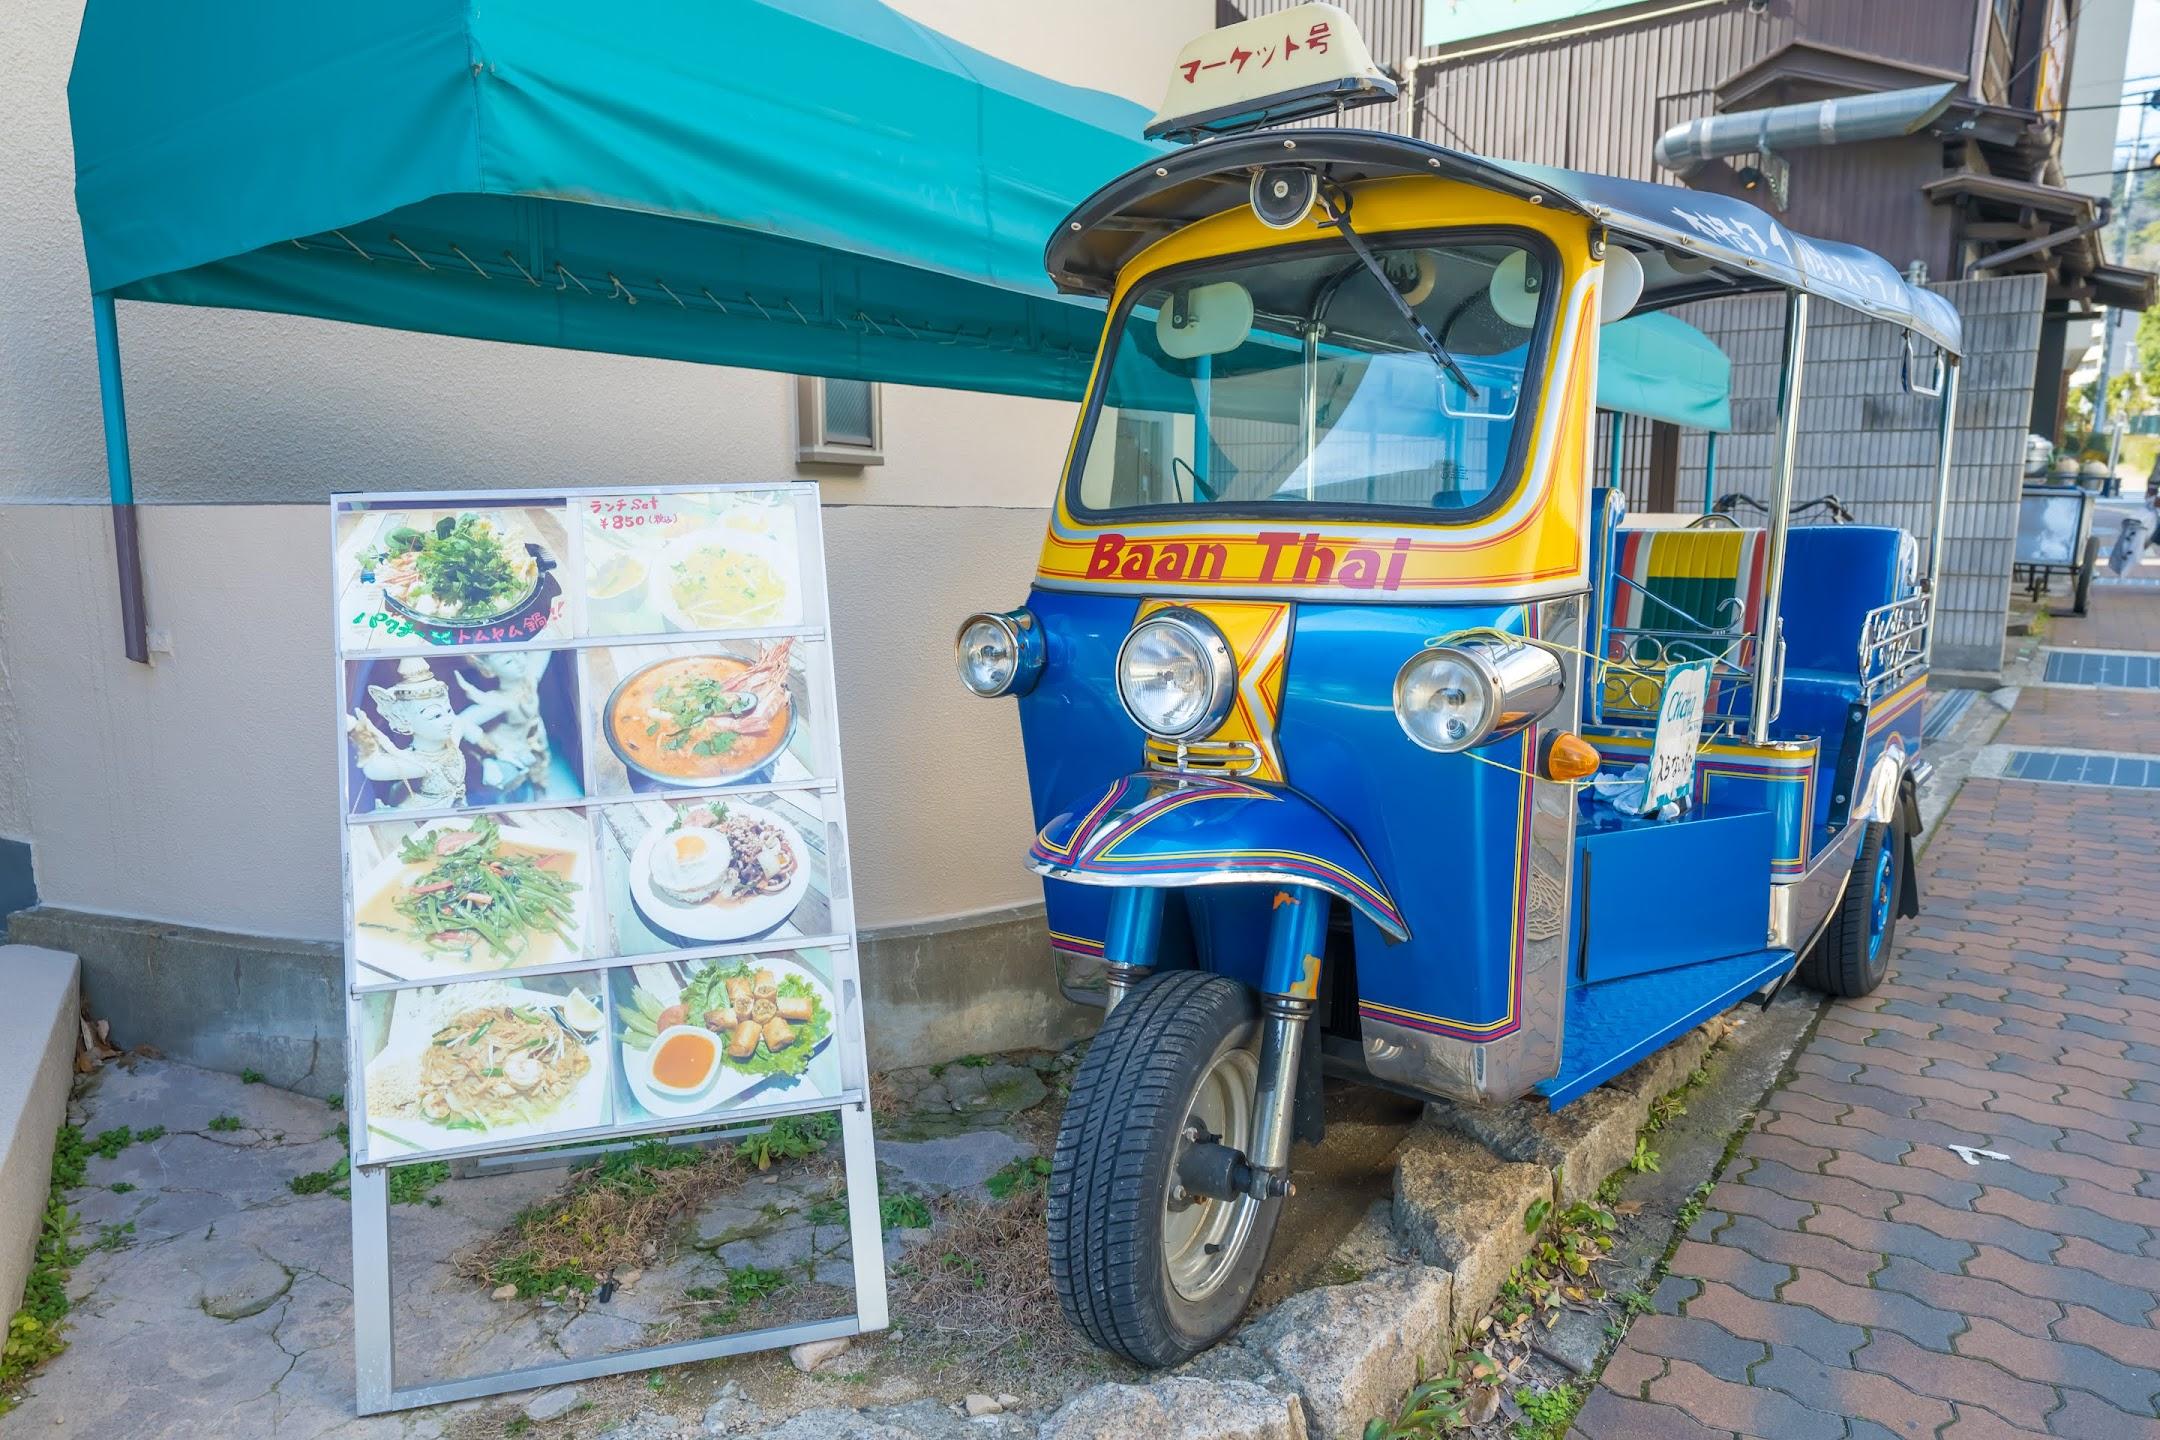 神戸 Baan Thai Market1